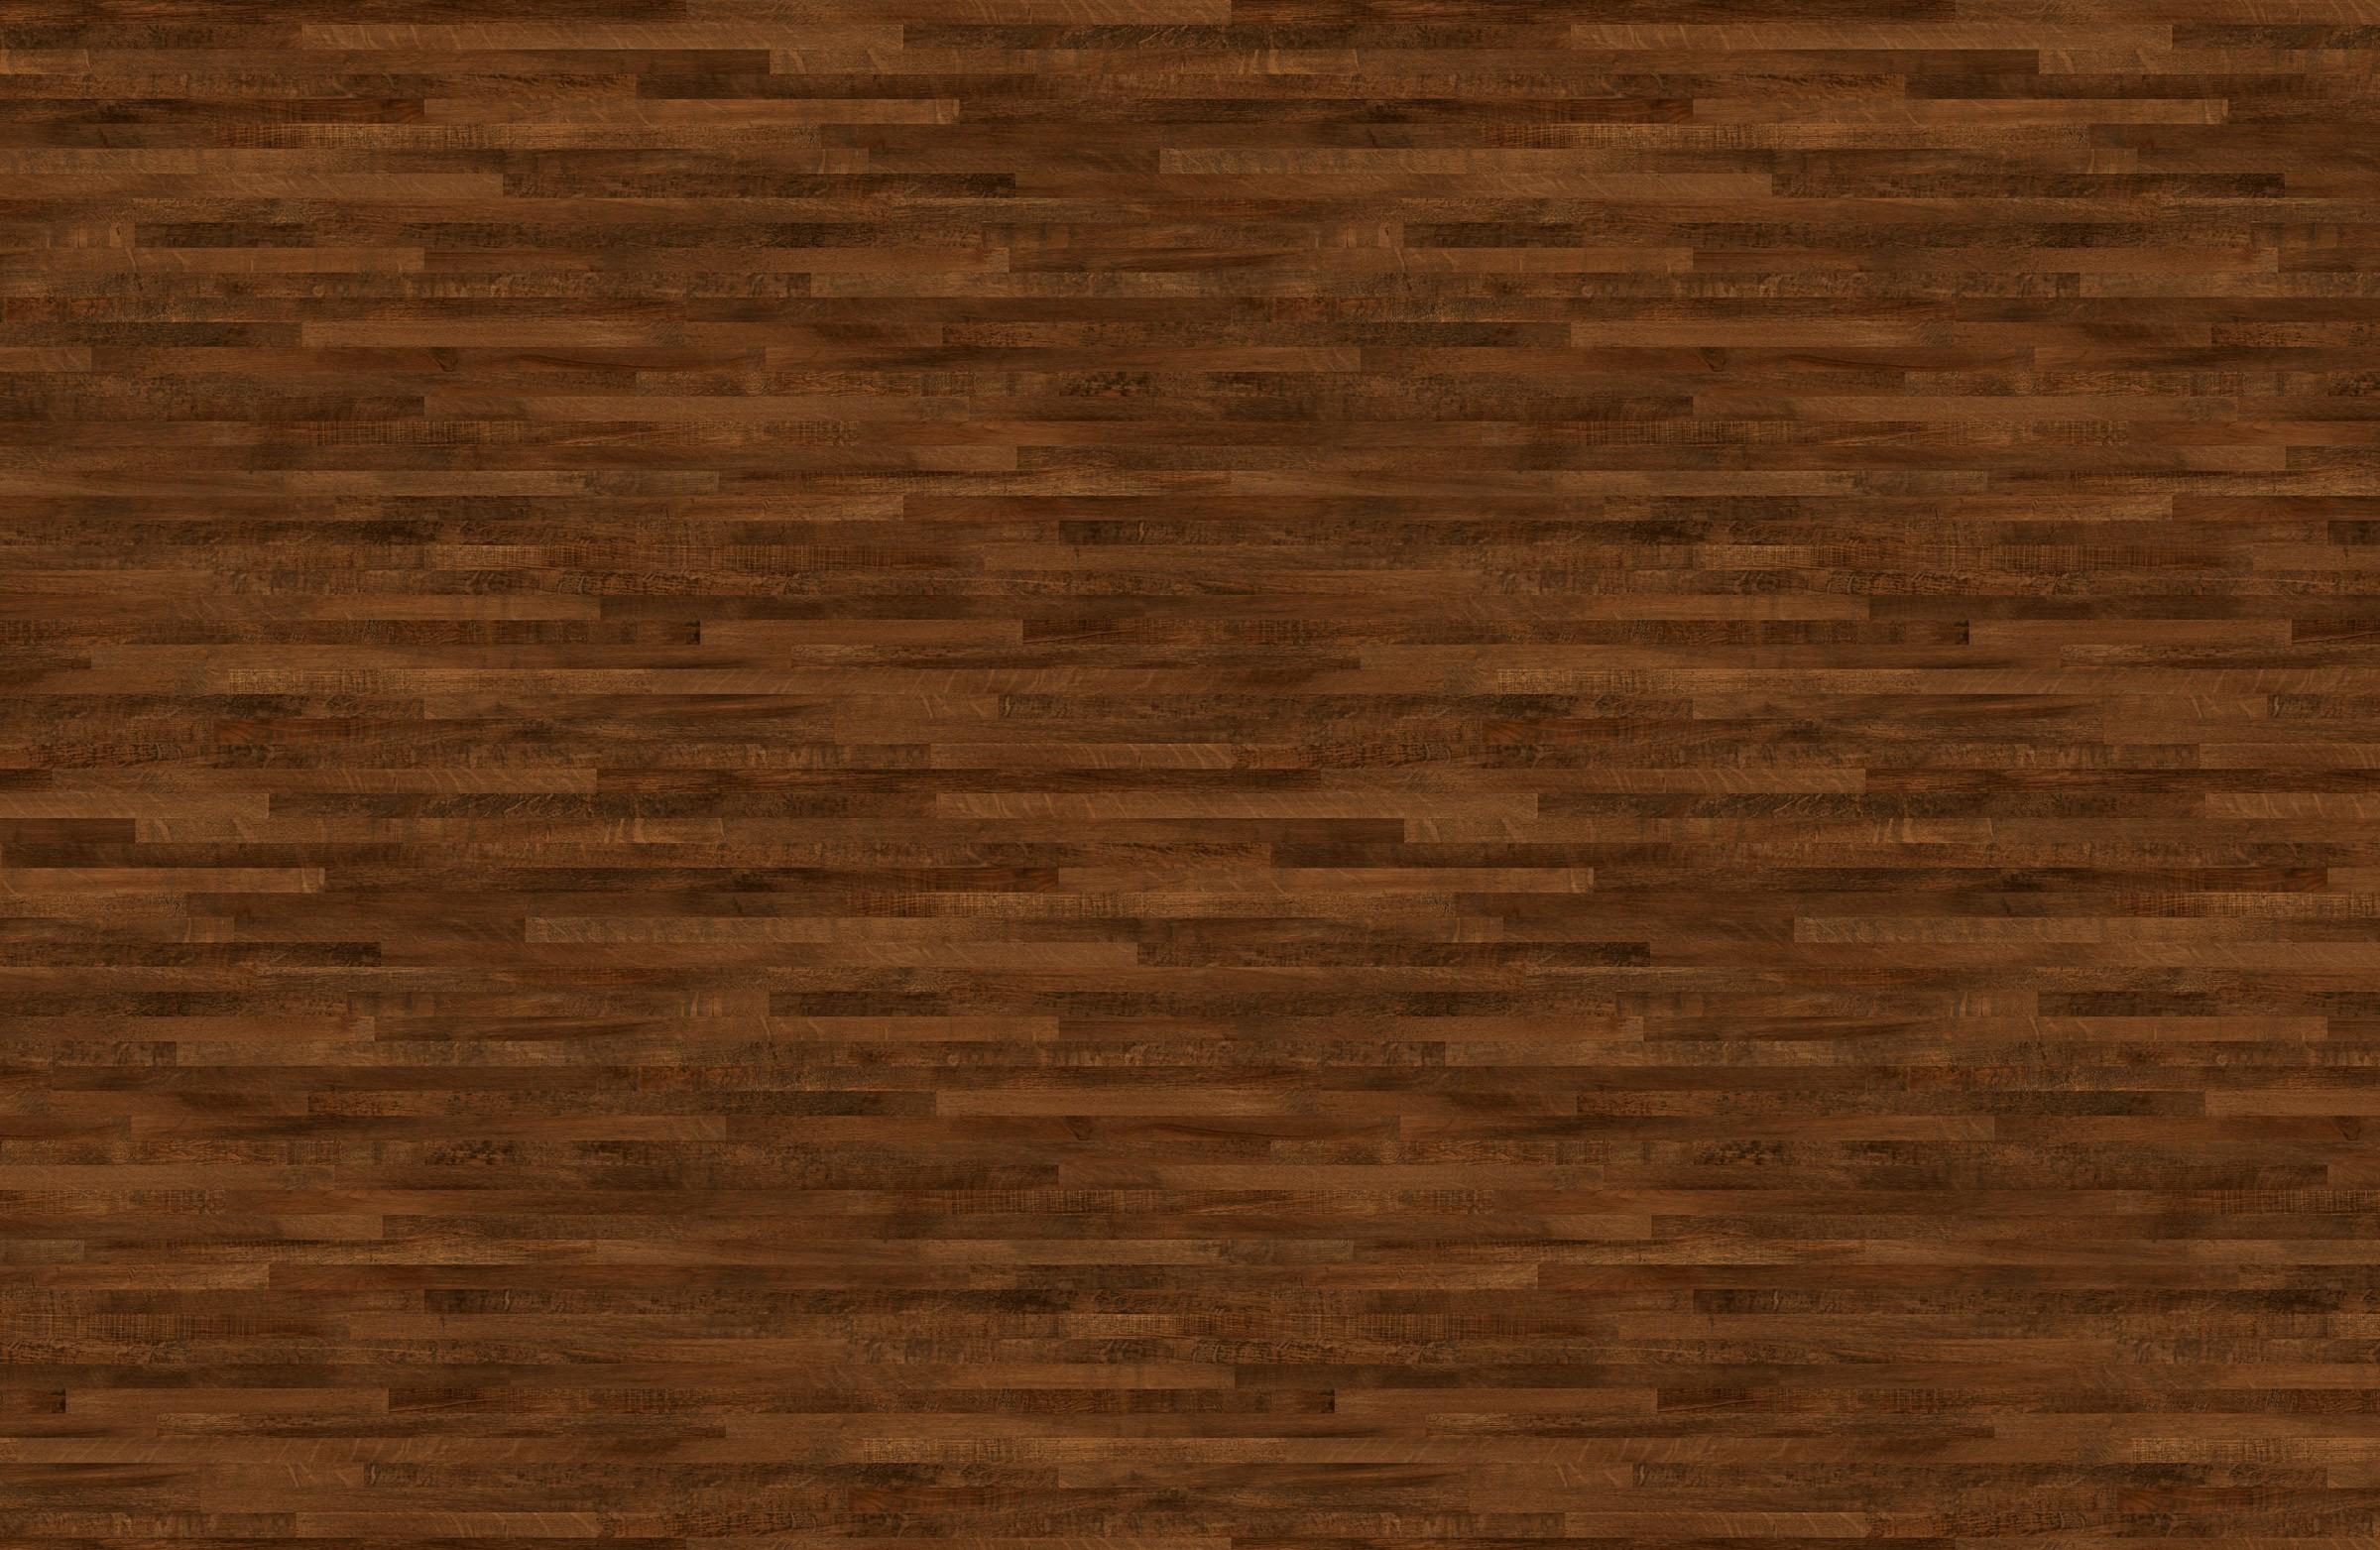 7973k Old Mill Oak Laminate Countertops